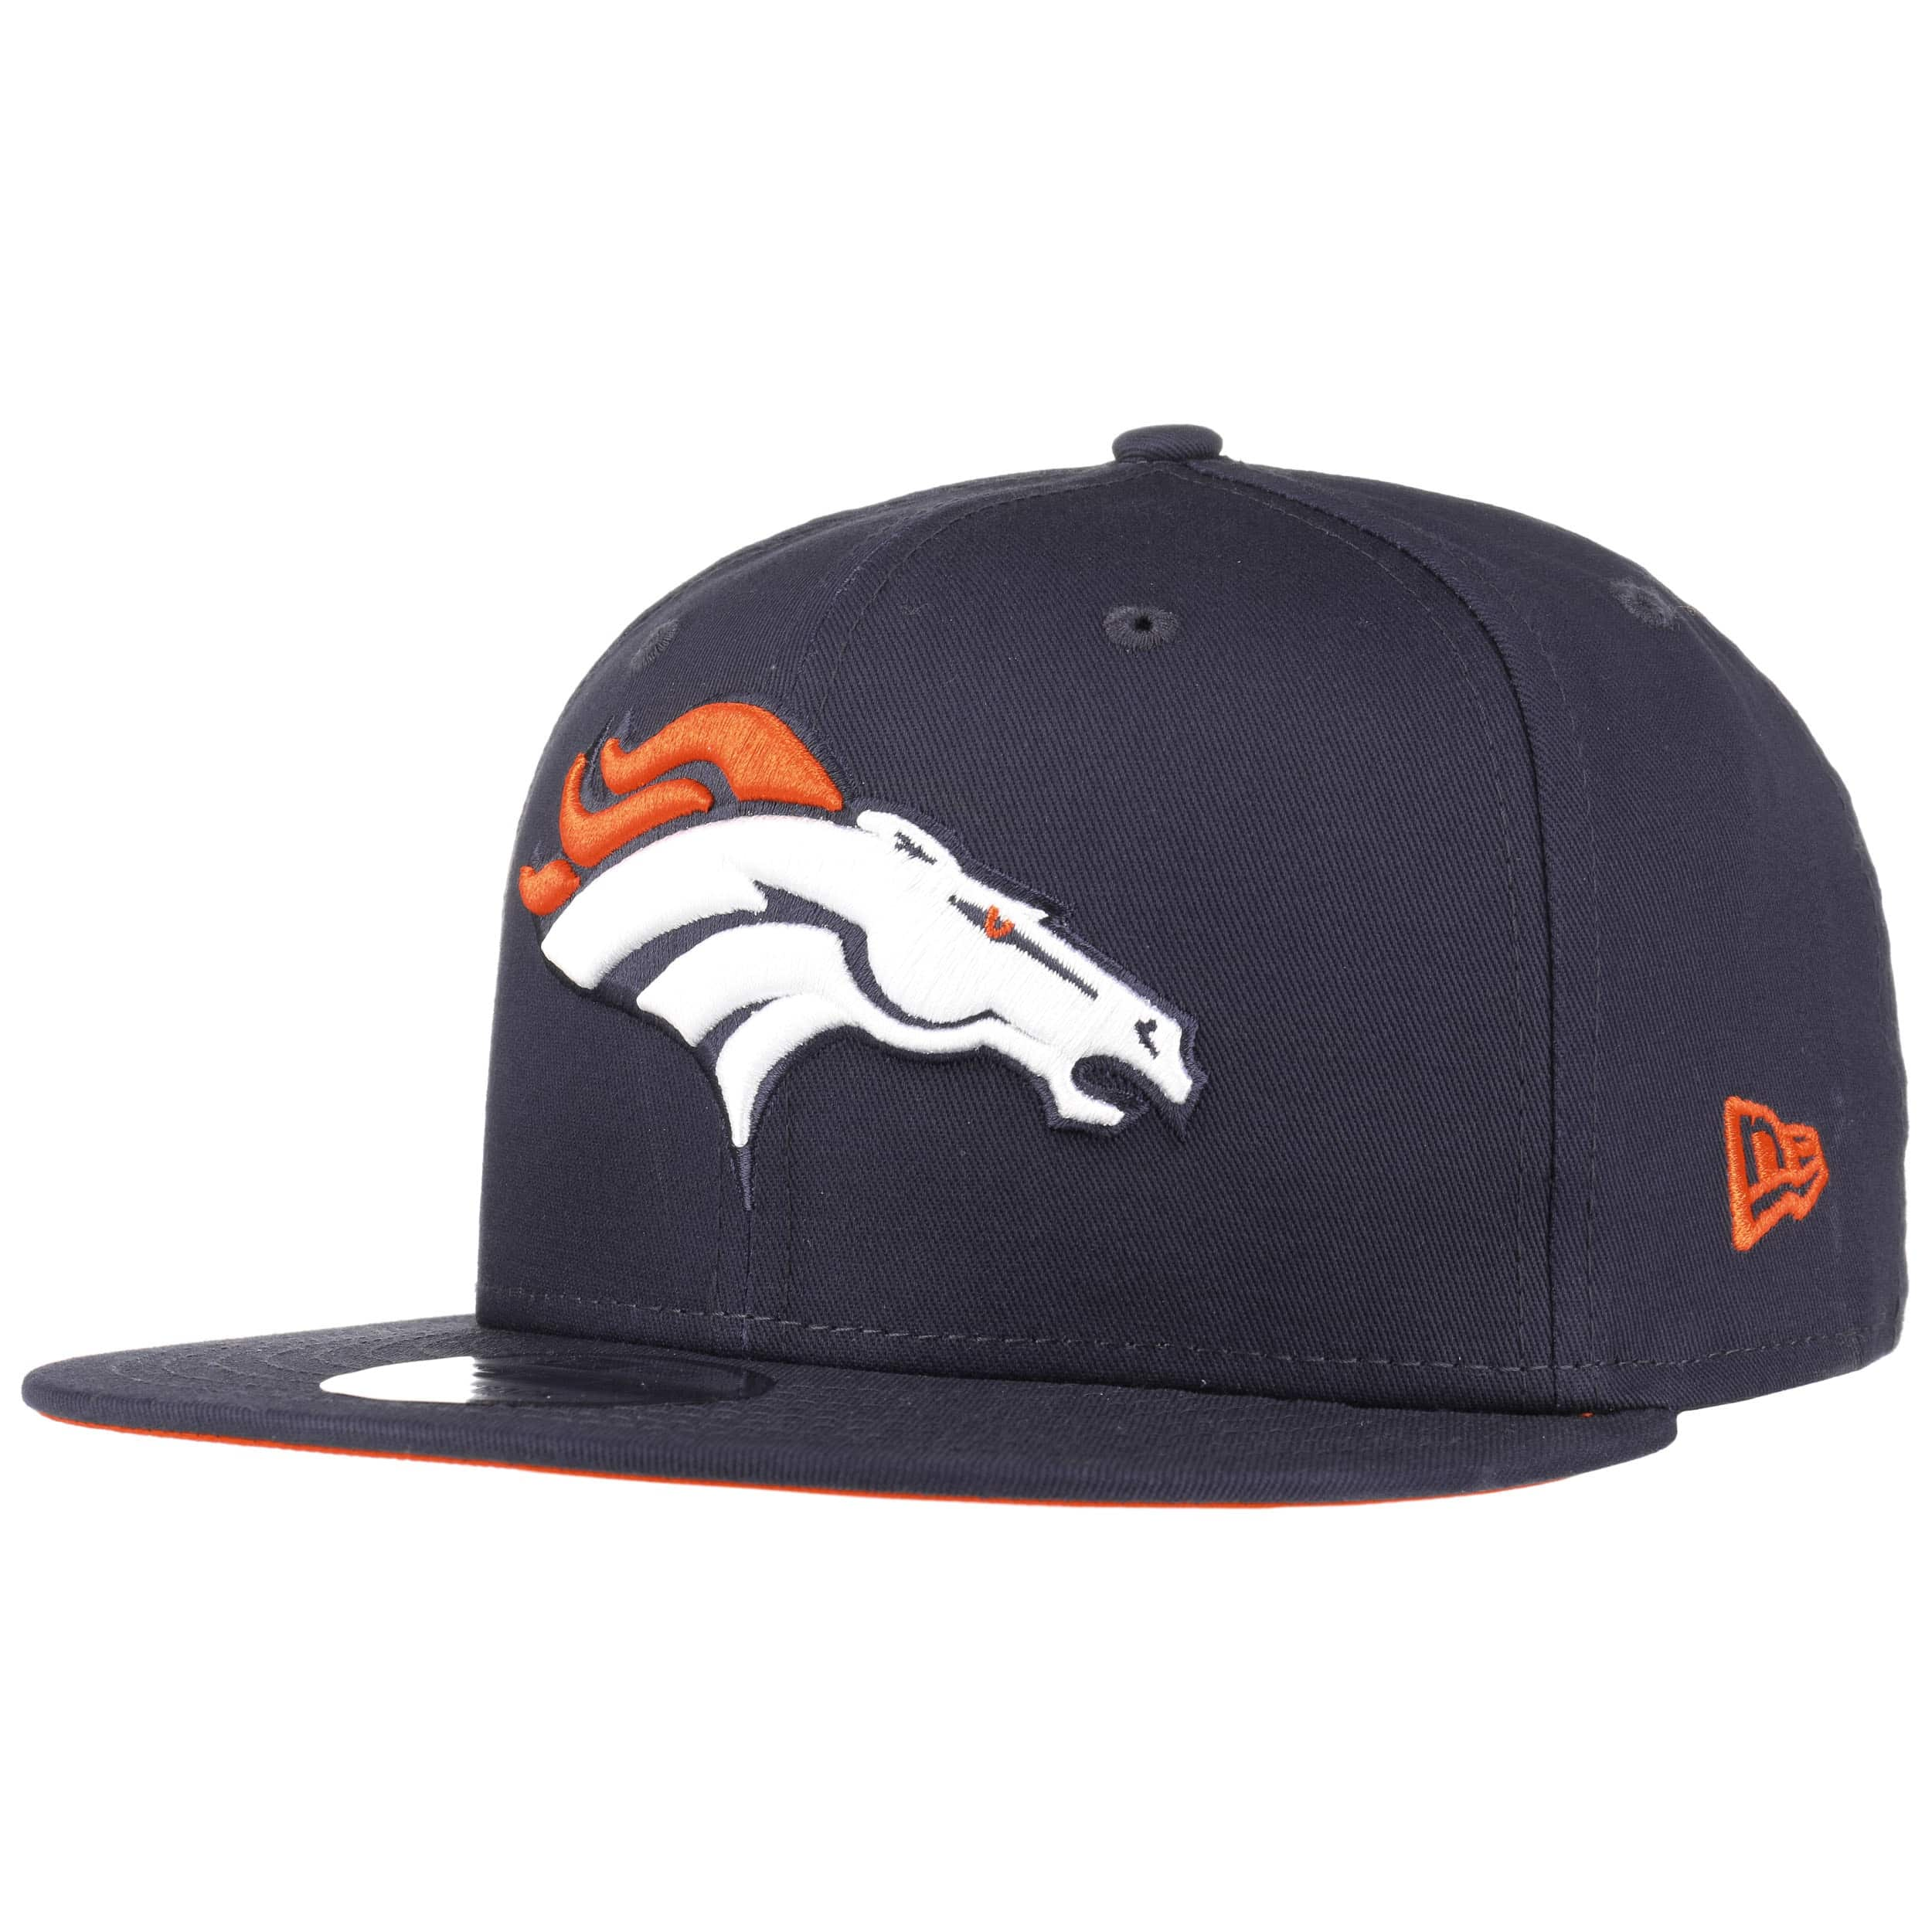 Gorra 9Fifty Classics Broncos by New Era - Gorras - sombreroshop.es 7ef60b0a708